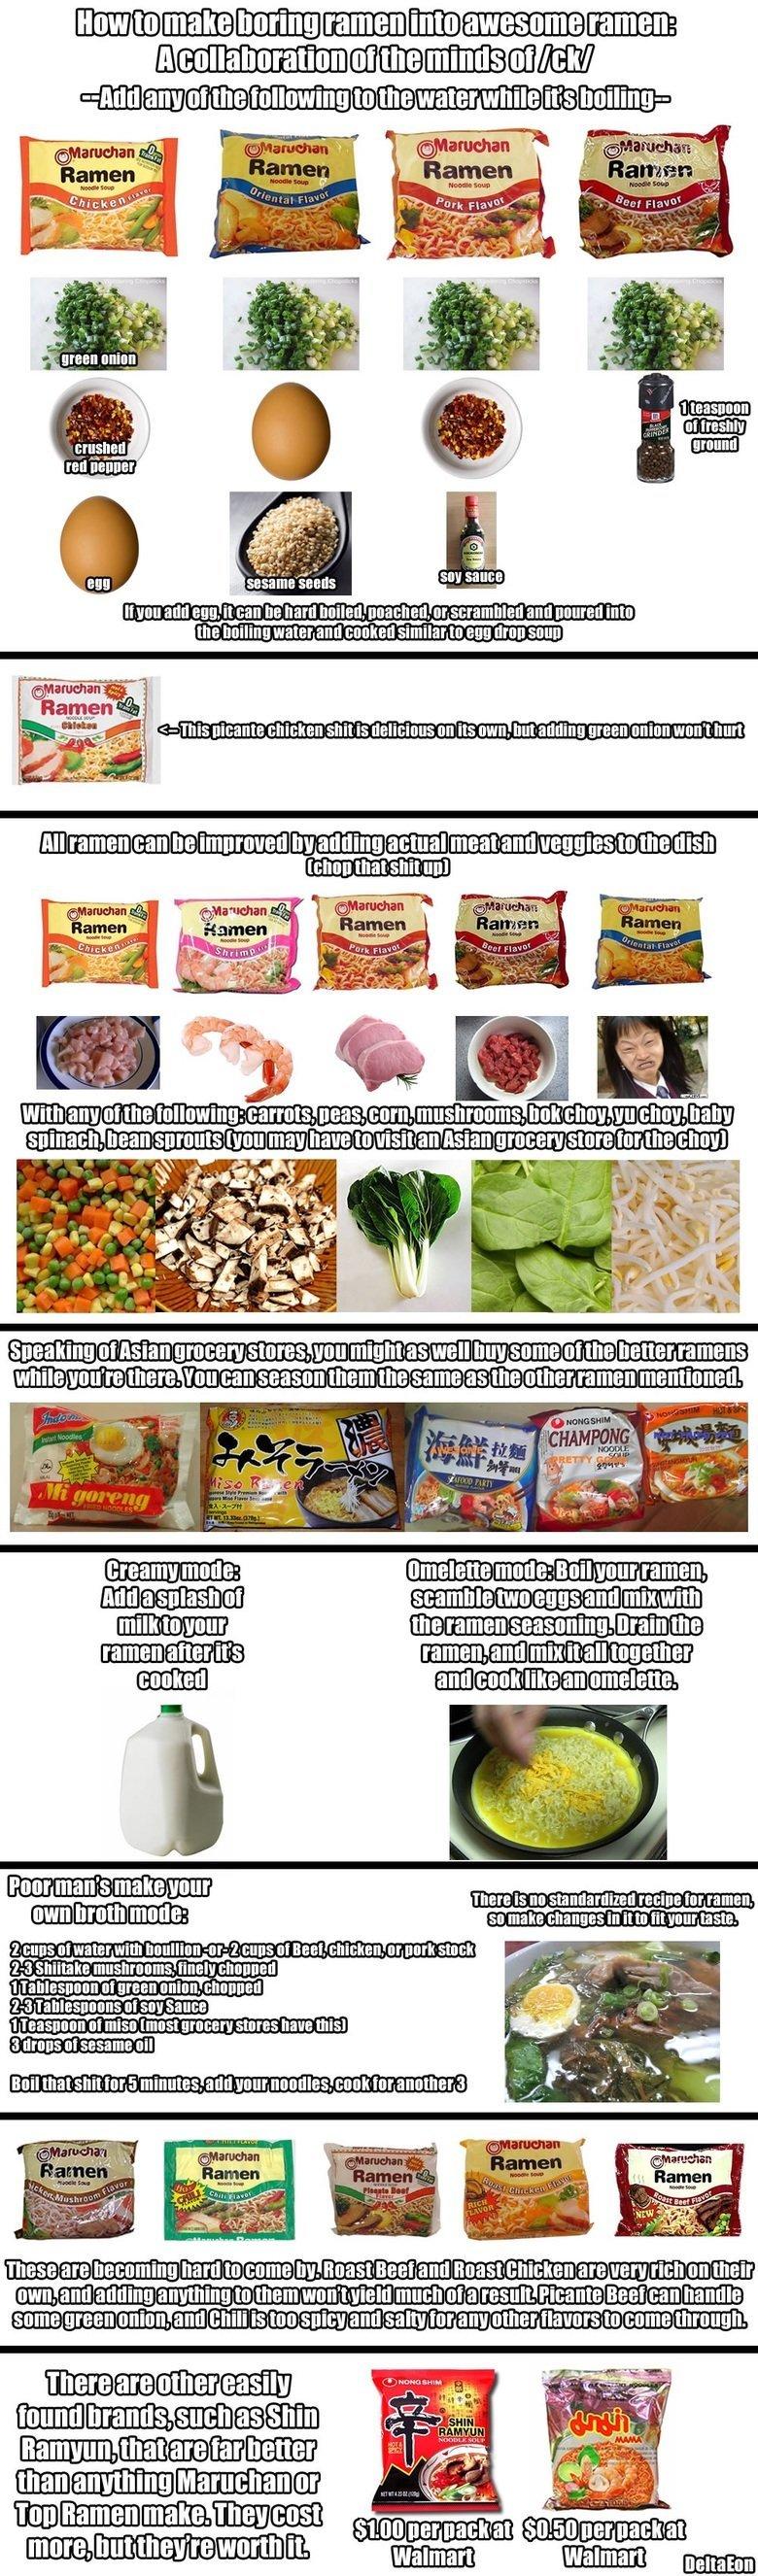 Glorious ramen. Noodles, spaghetti, pasta, ravioli. T nestle durum and unwed inn! In and man solid 9 nus mania an IS ) l. an its mum! Ellen ITT& nun All rasenga